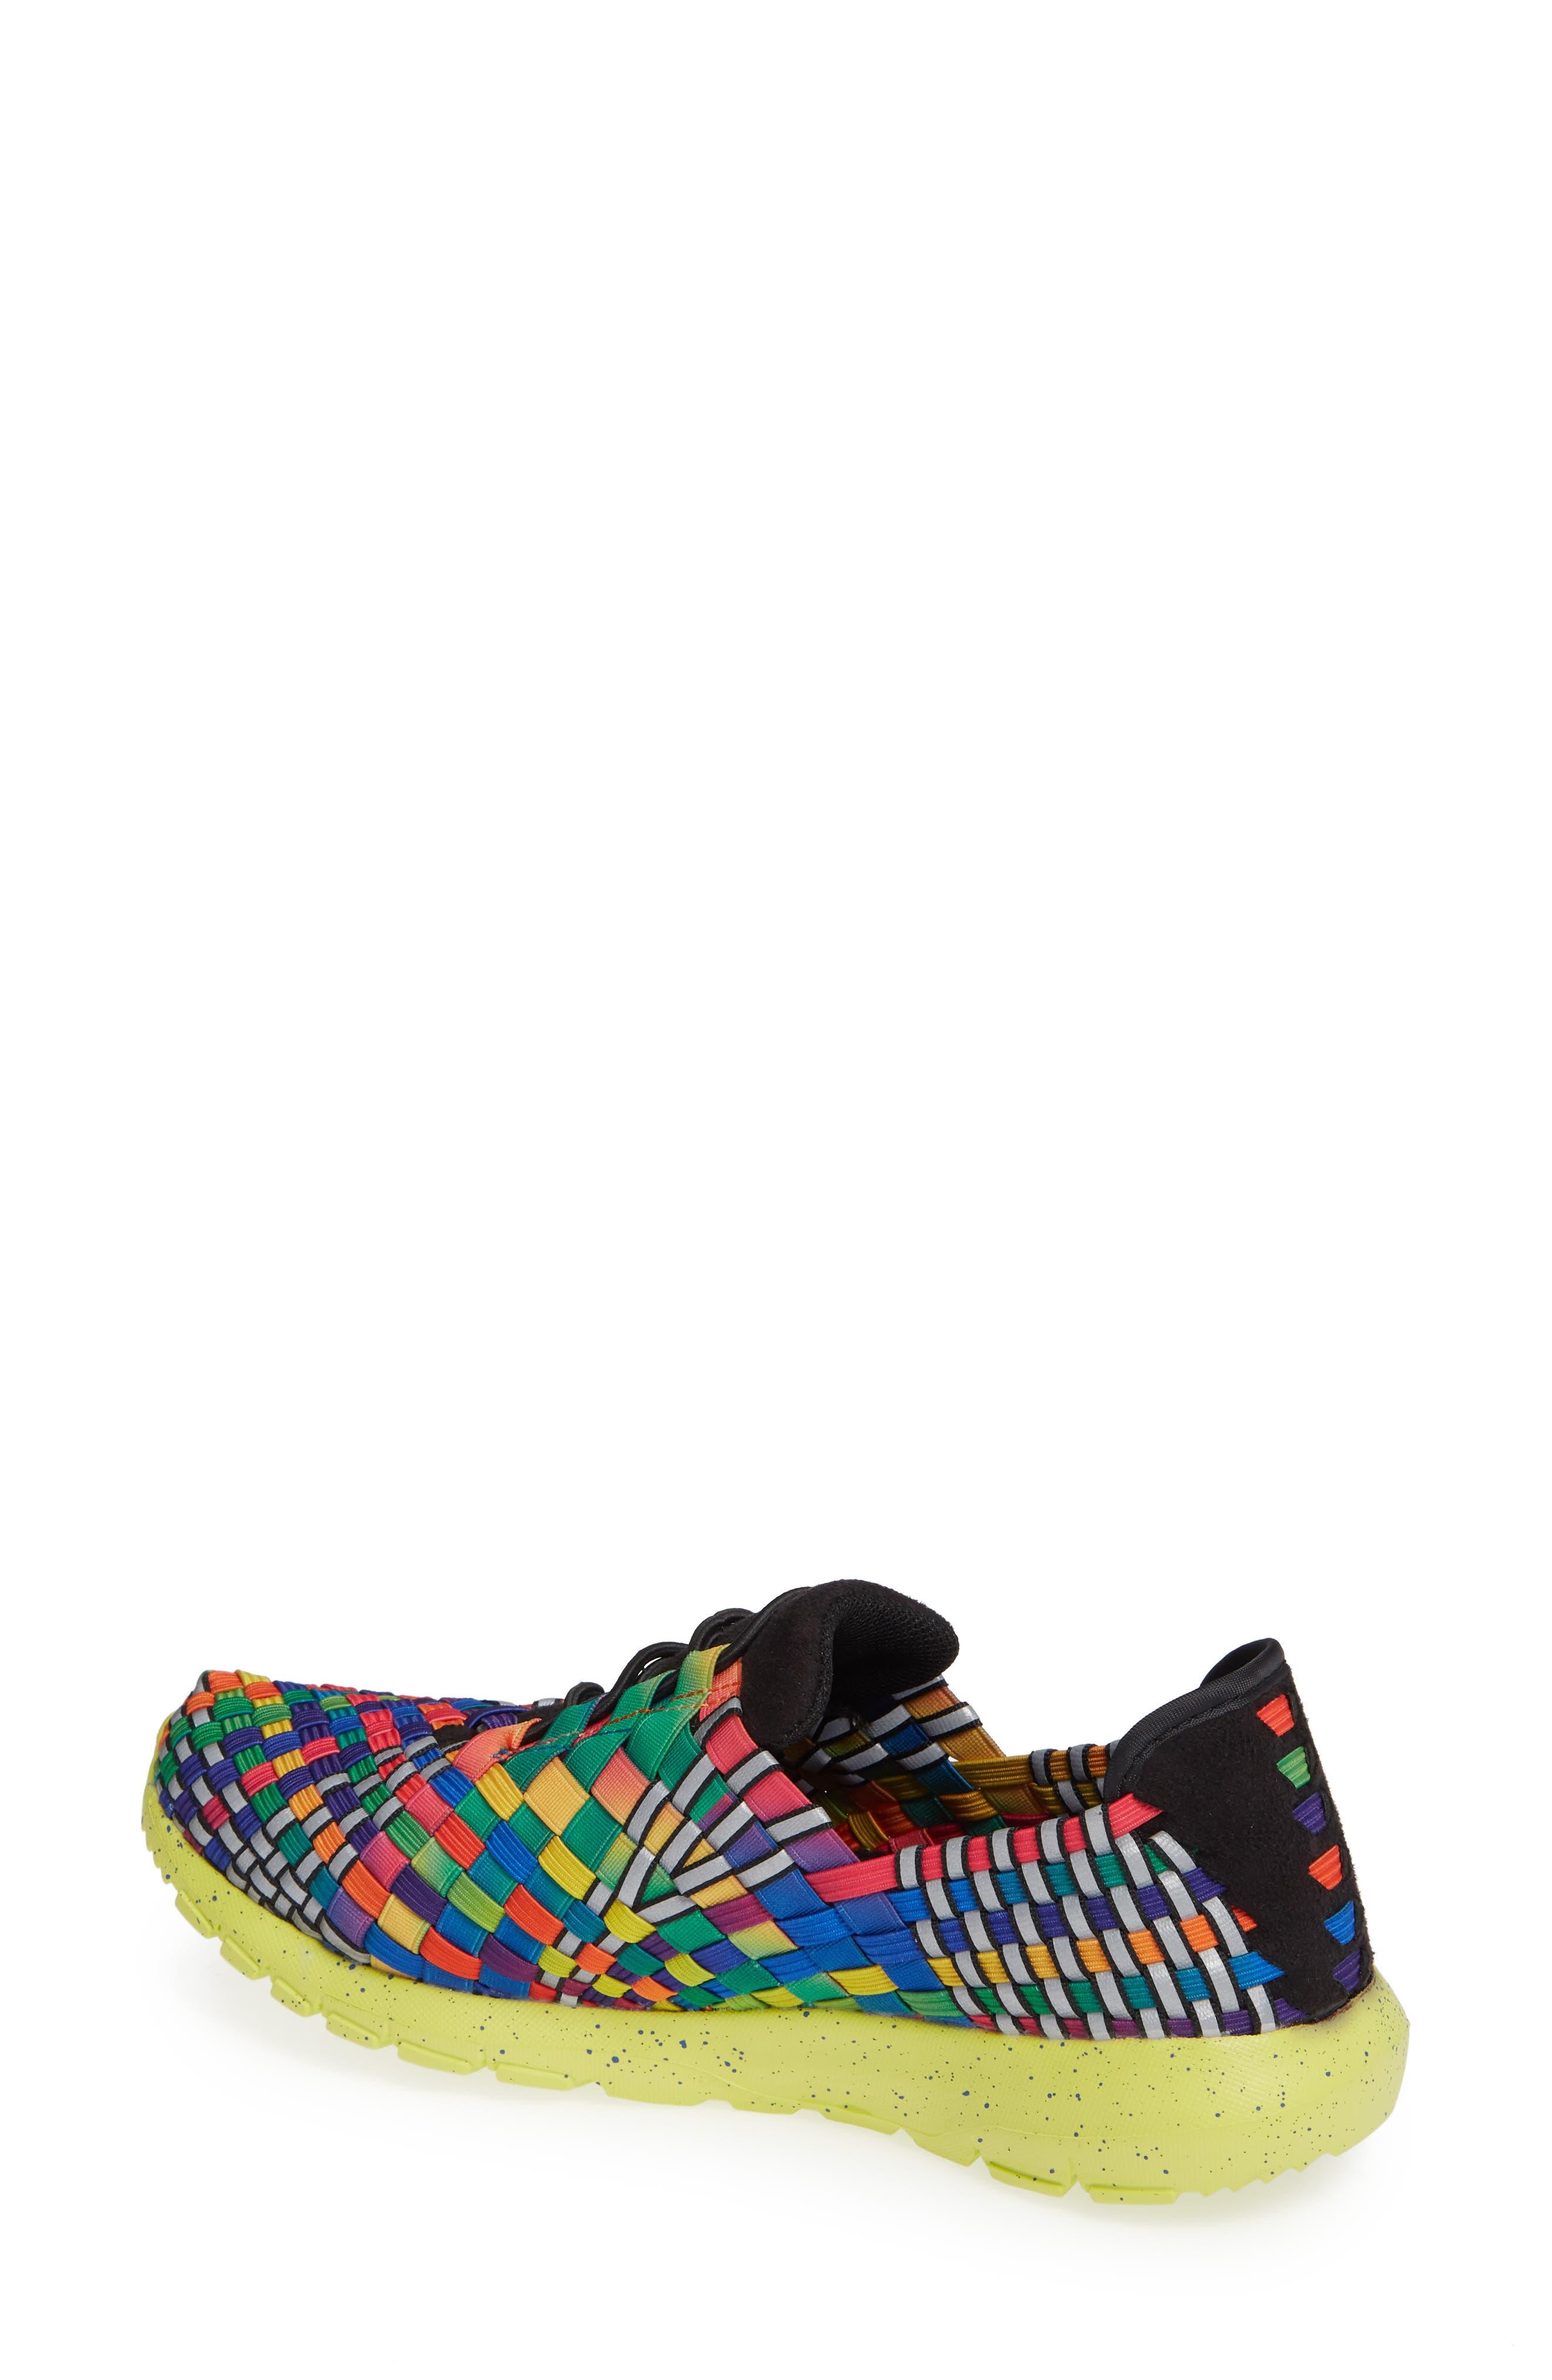 Runners Victoria Sneaker,                             Alternate thumbnail 2, color,                             Black Multi Reflective Fabric